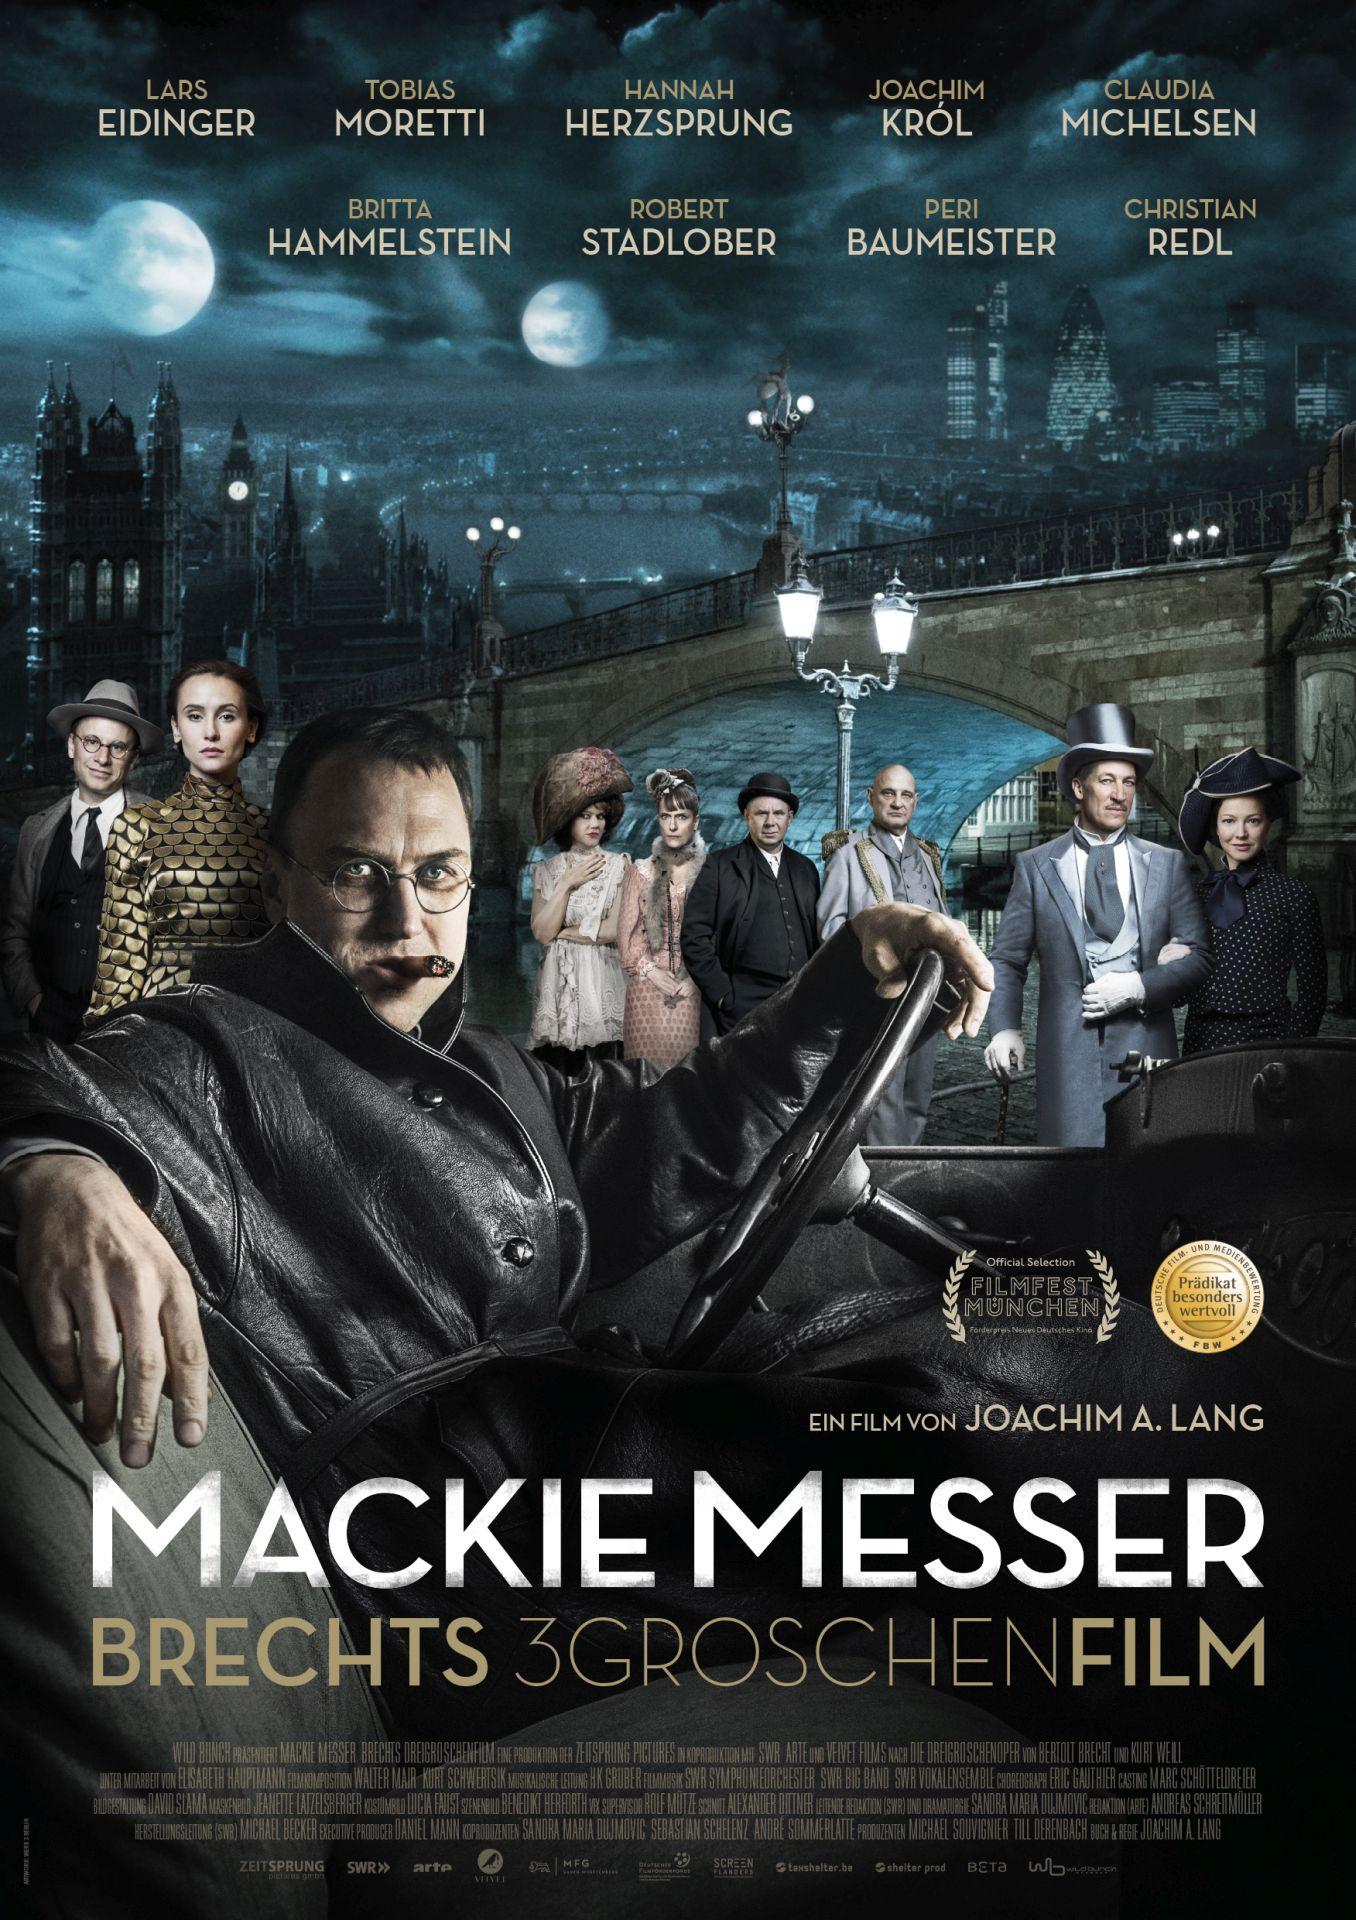 Film am 20. Mai 2019